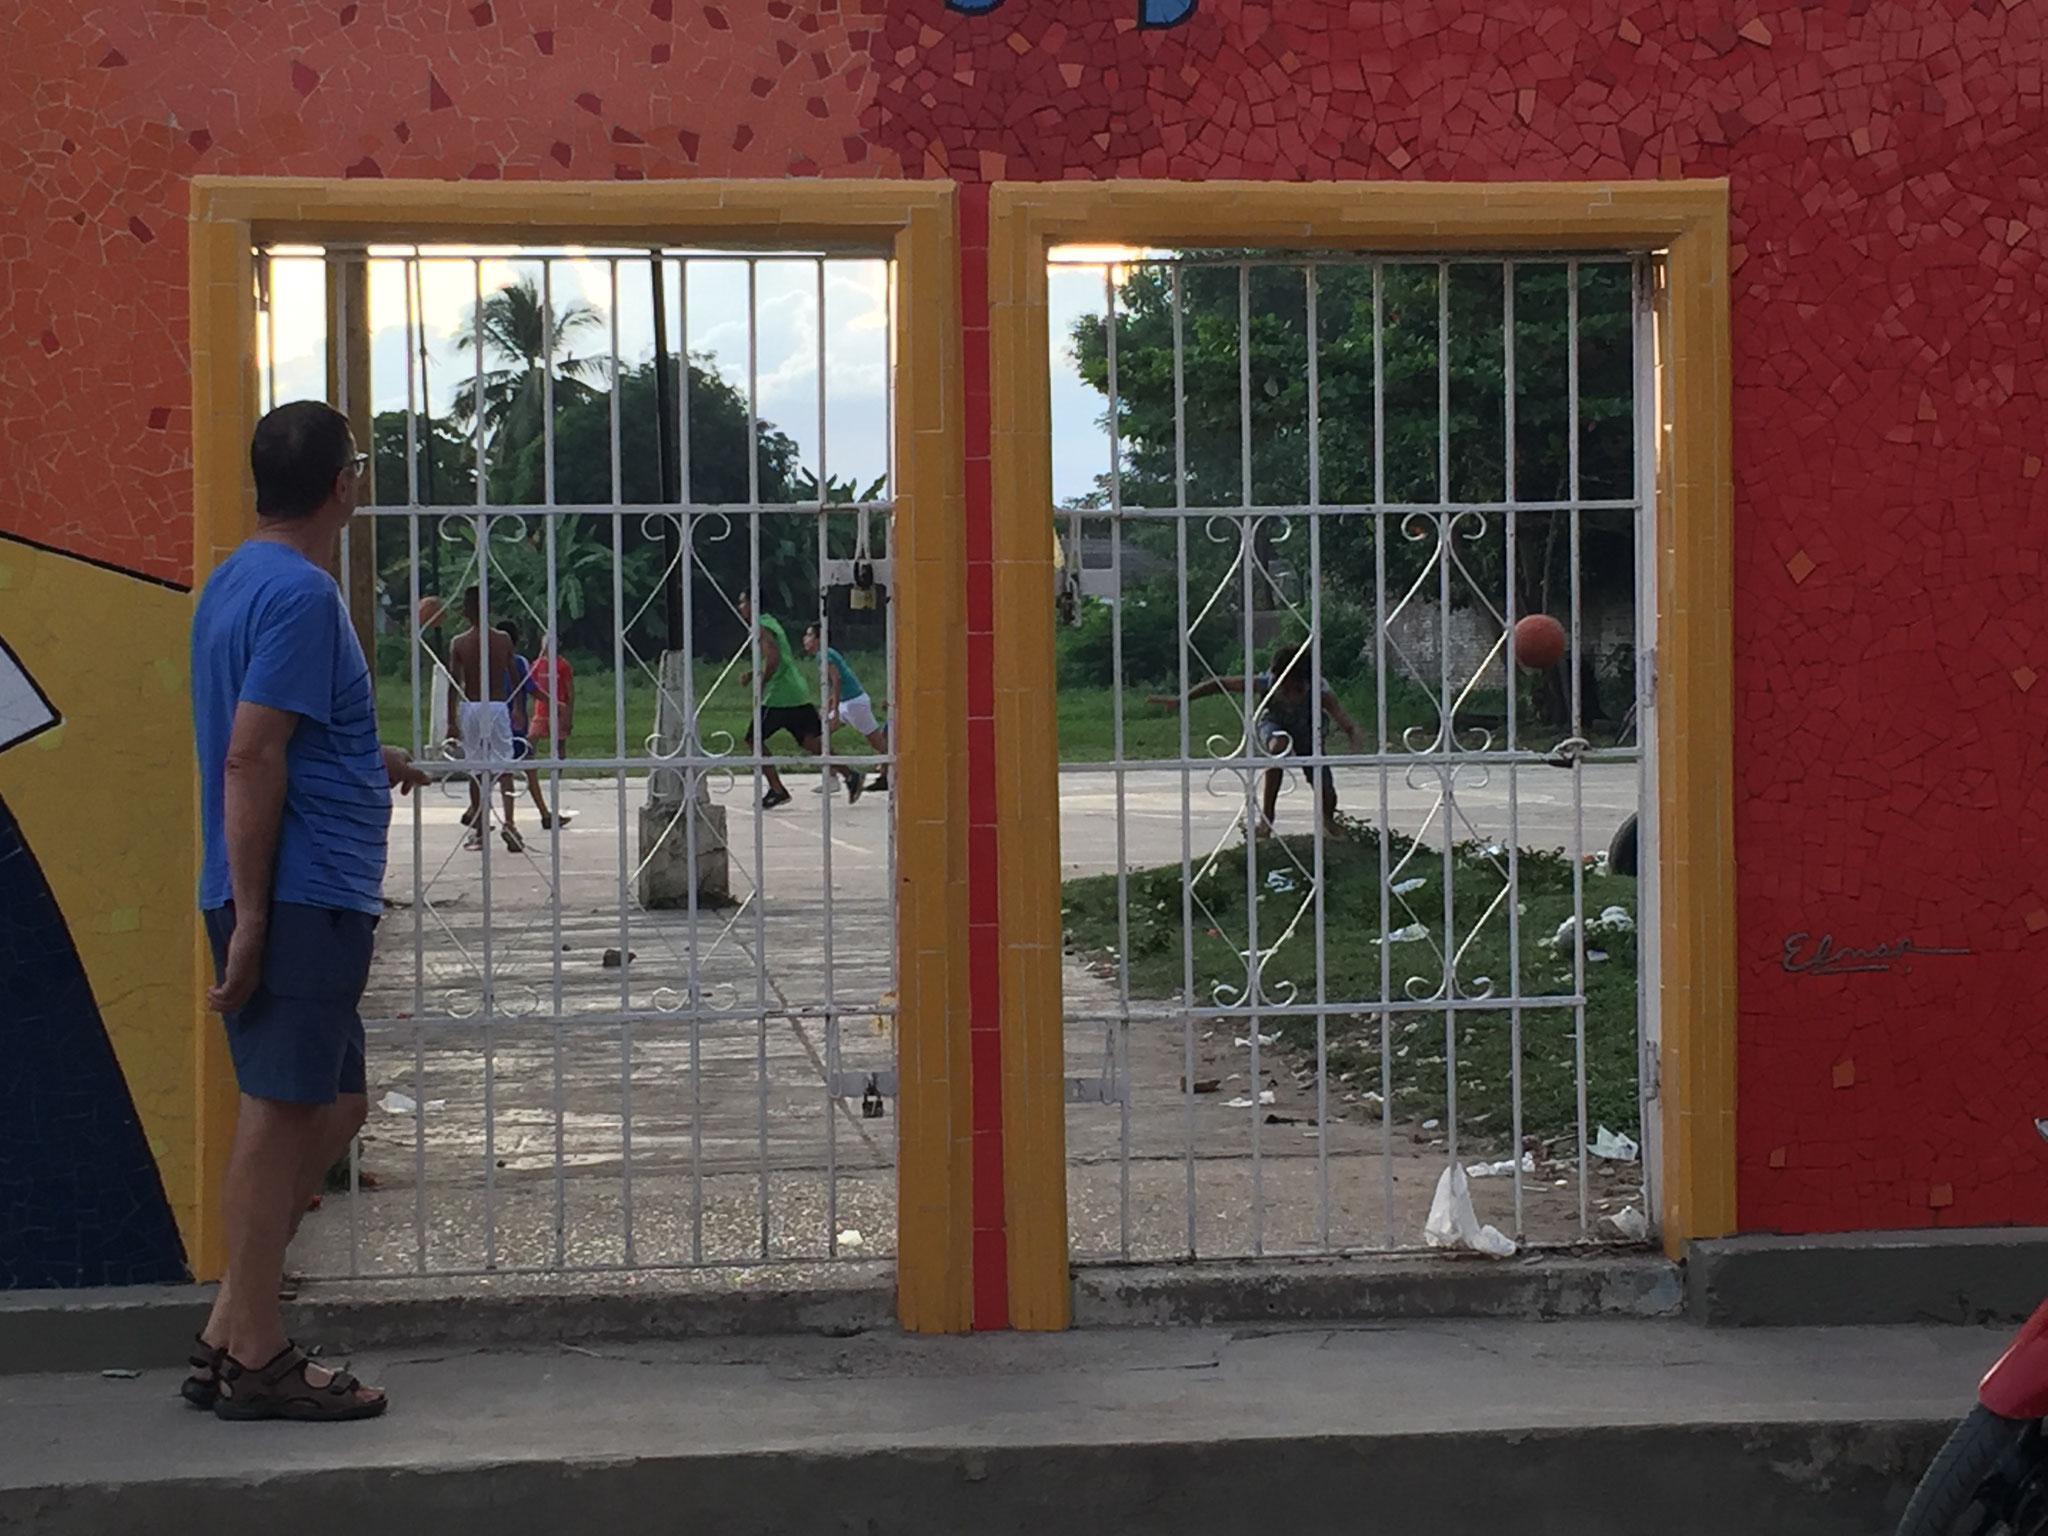 Fussballspiel hinter Gittern